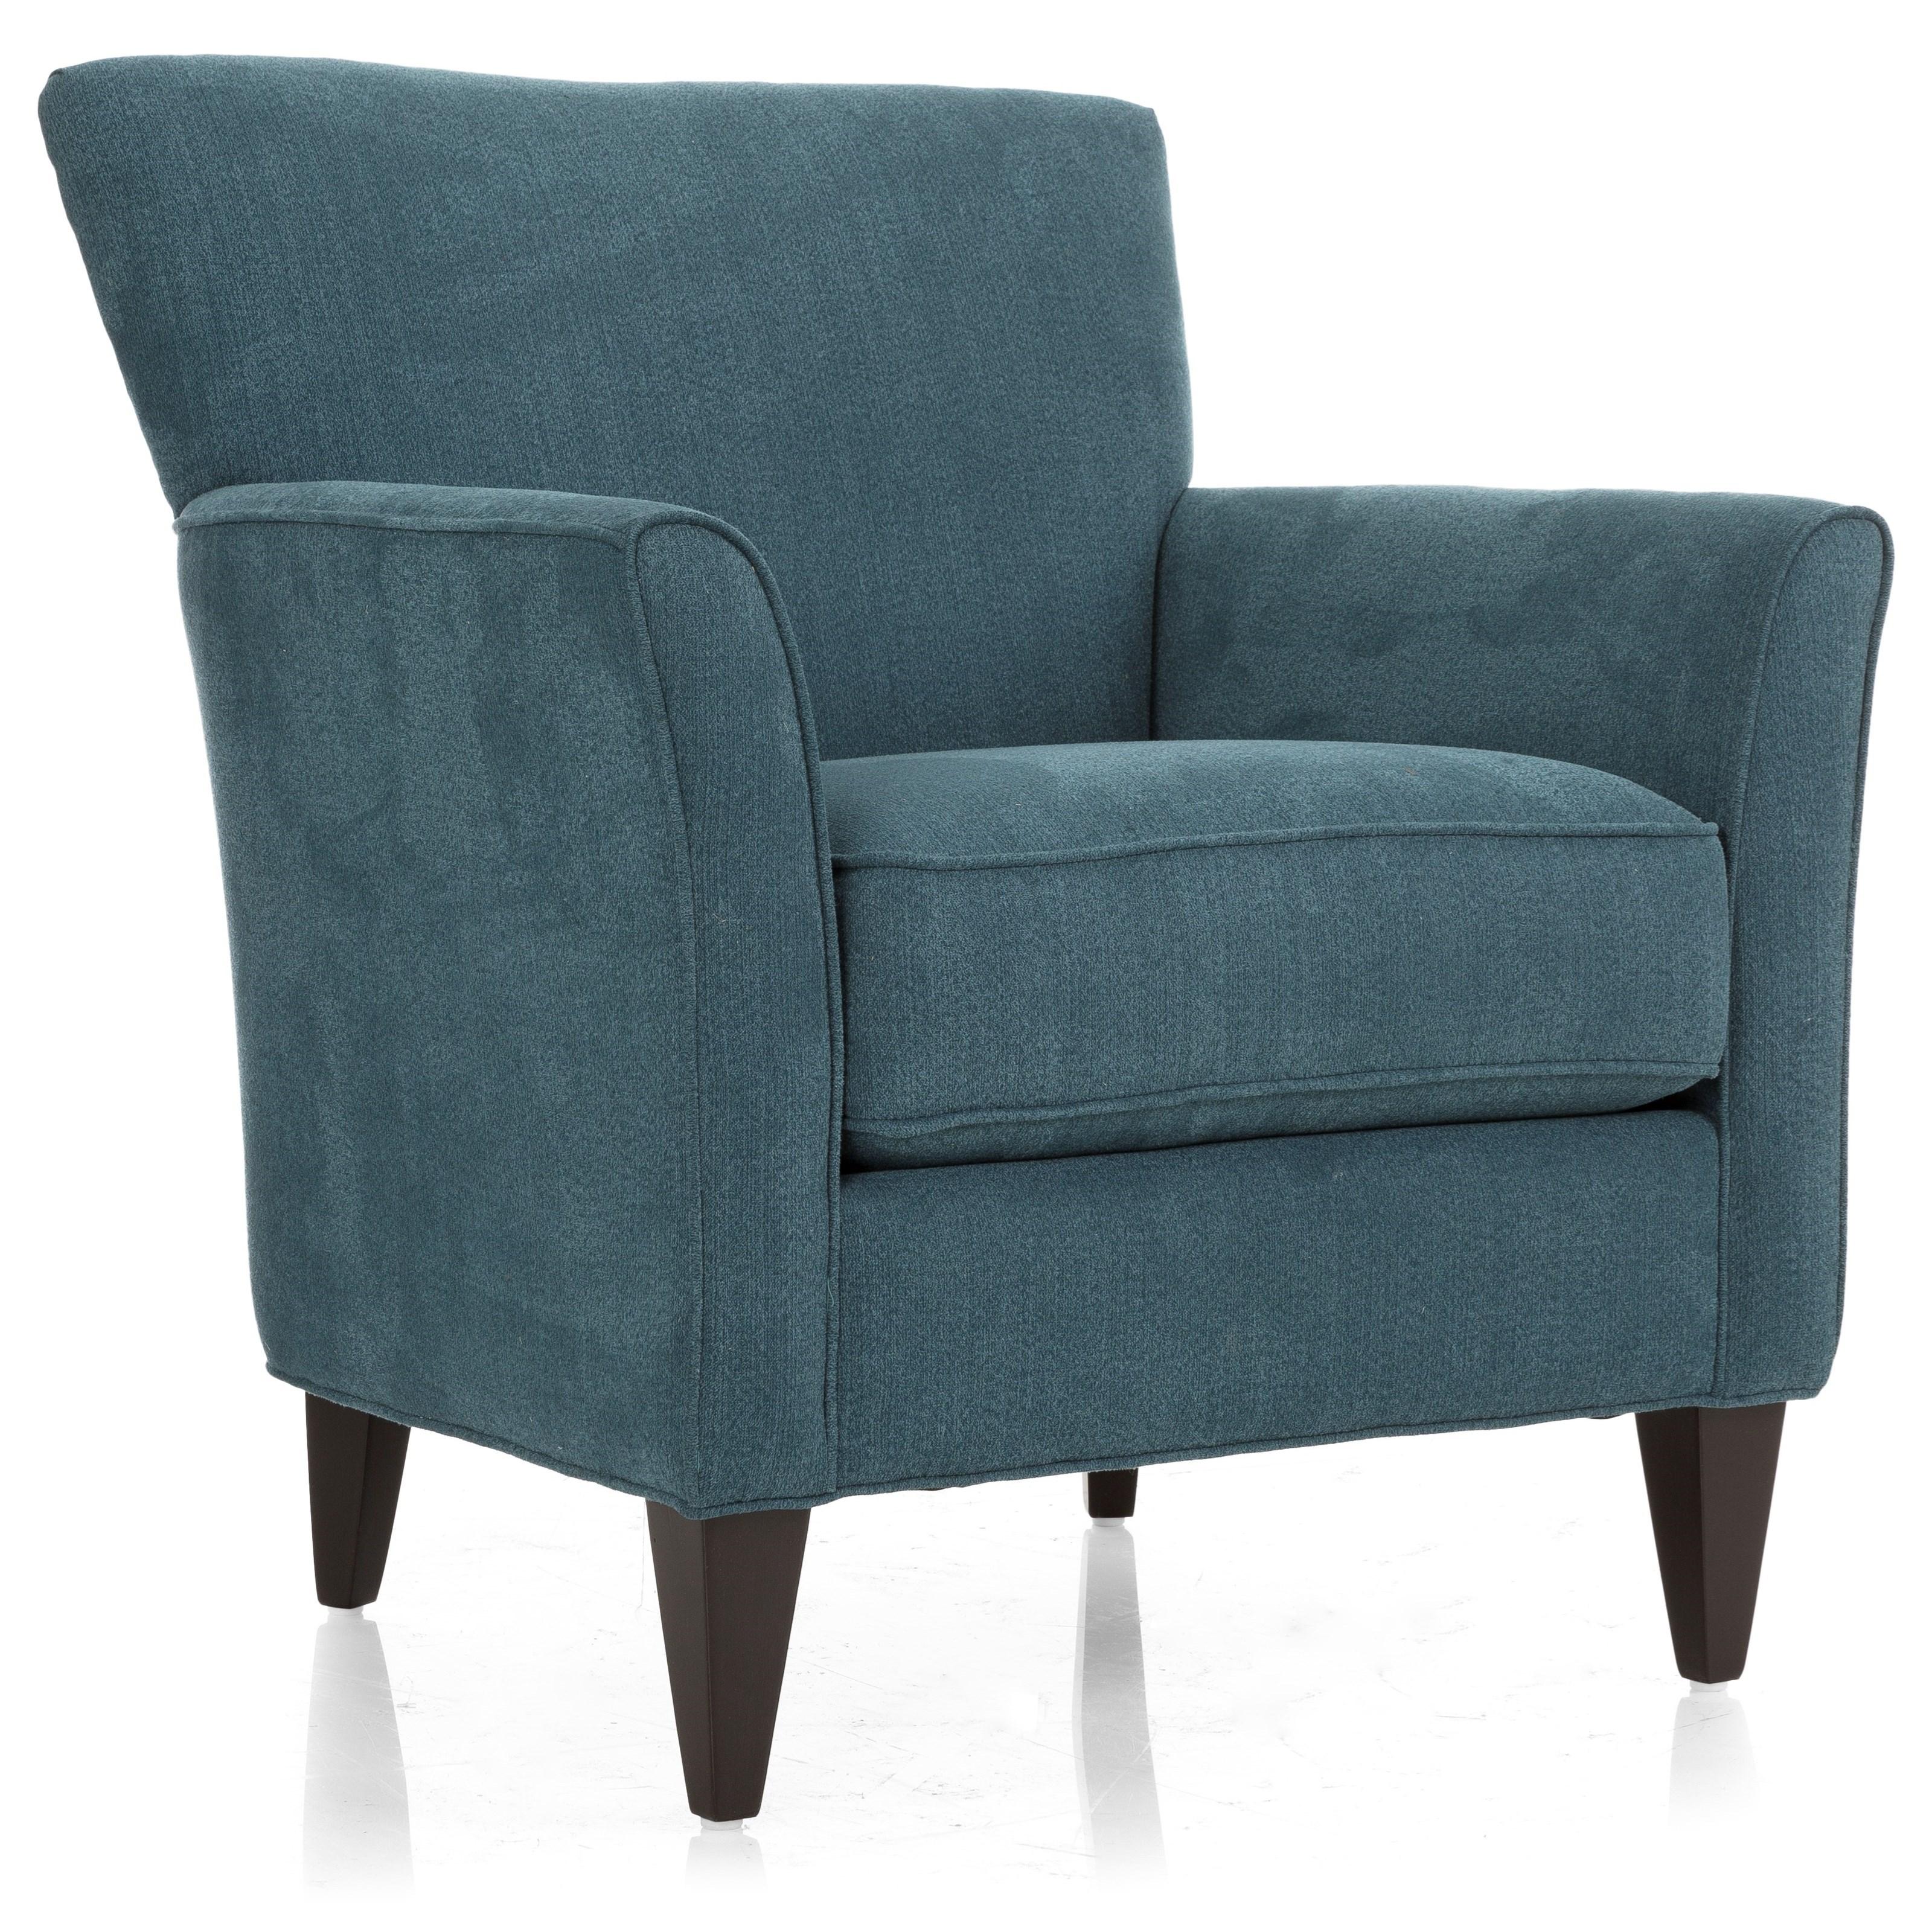 Decor-Rest 2668 Chair - Item Number: 2668 CHAIR-ALIS TUR